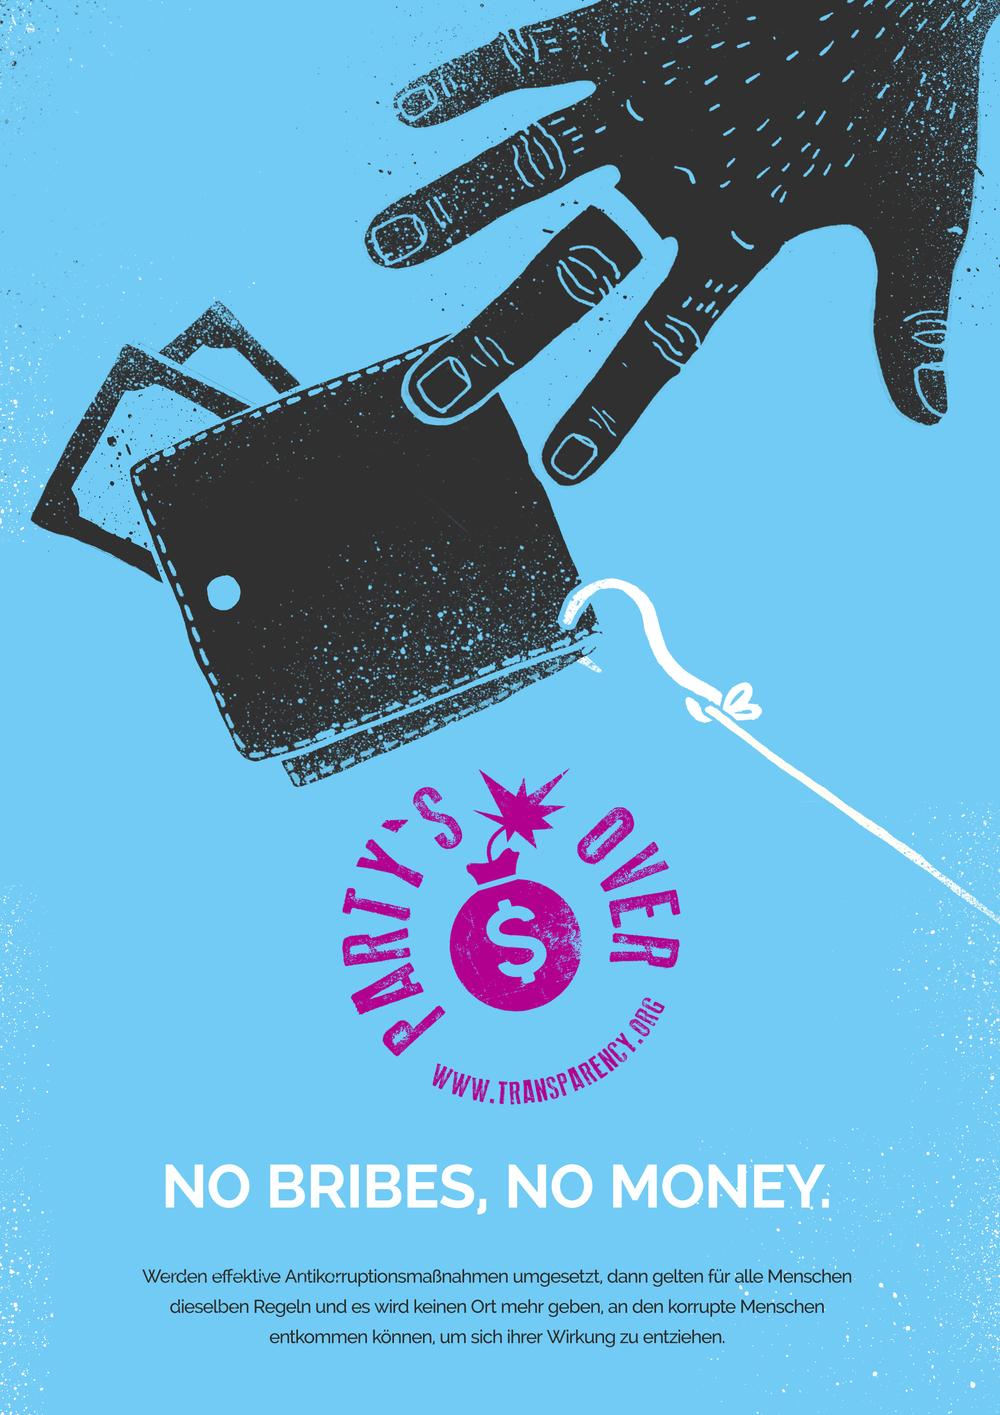 Transparency international poster blau004 bigger